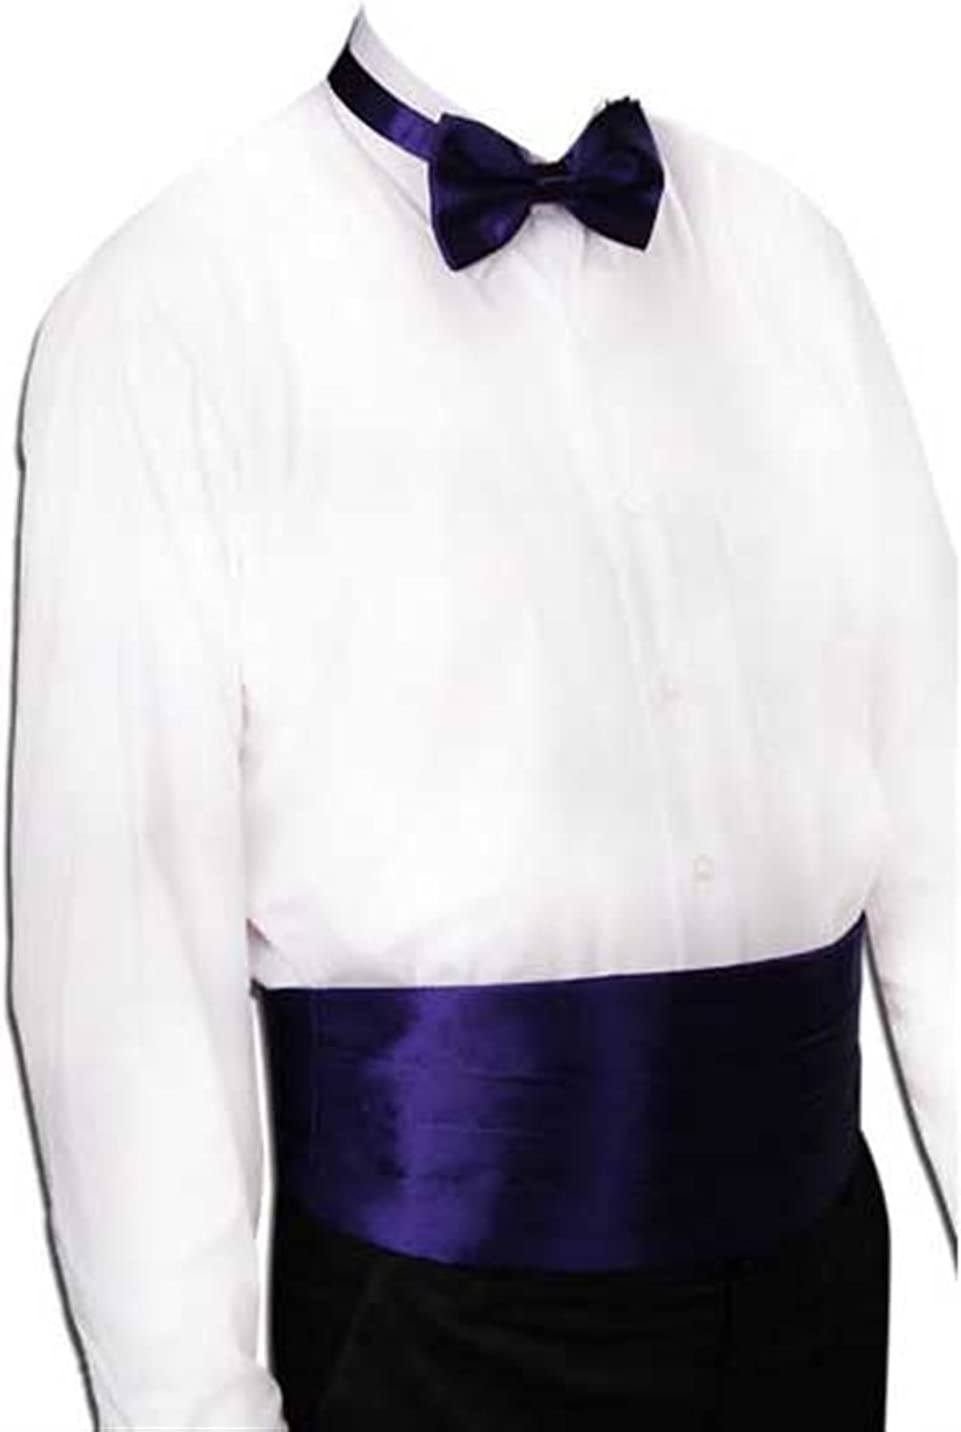 NJBYX Gentleman Solid Wide Silk Satin Elastic Belly Band Tuxedo Cummerbund Commercial Banquet Model Business Elite (Color : A)